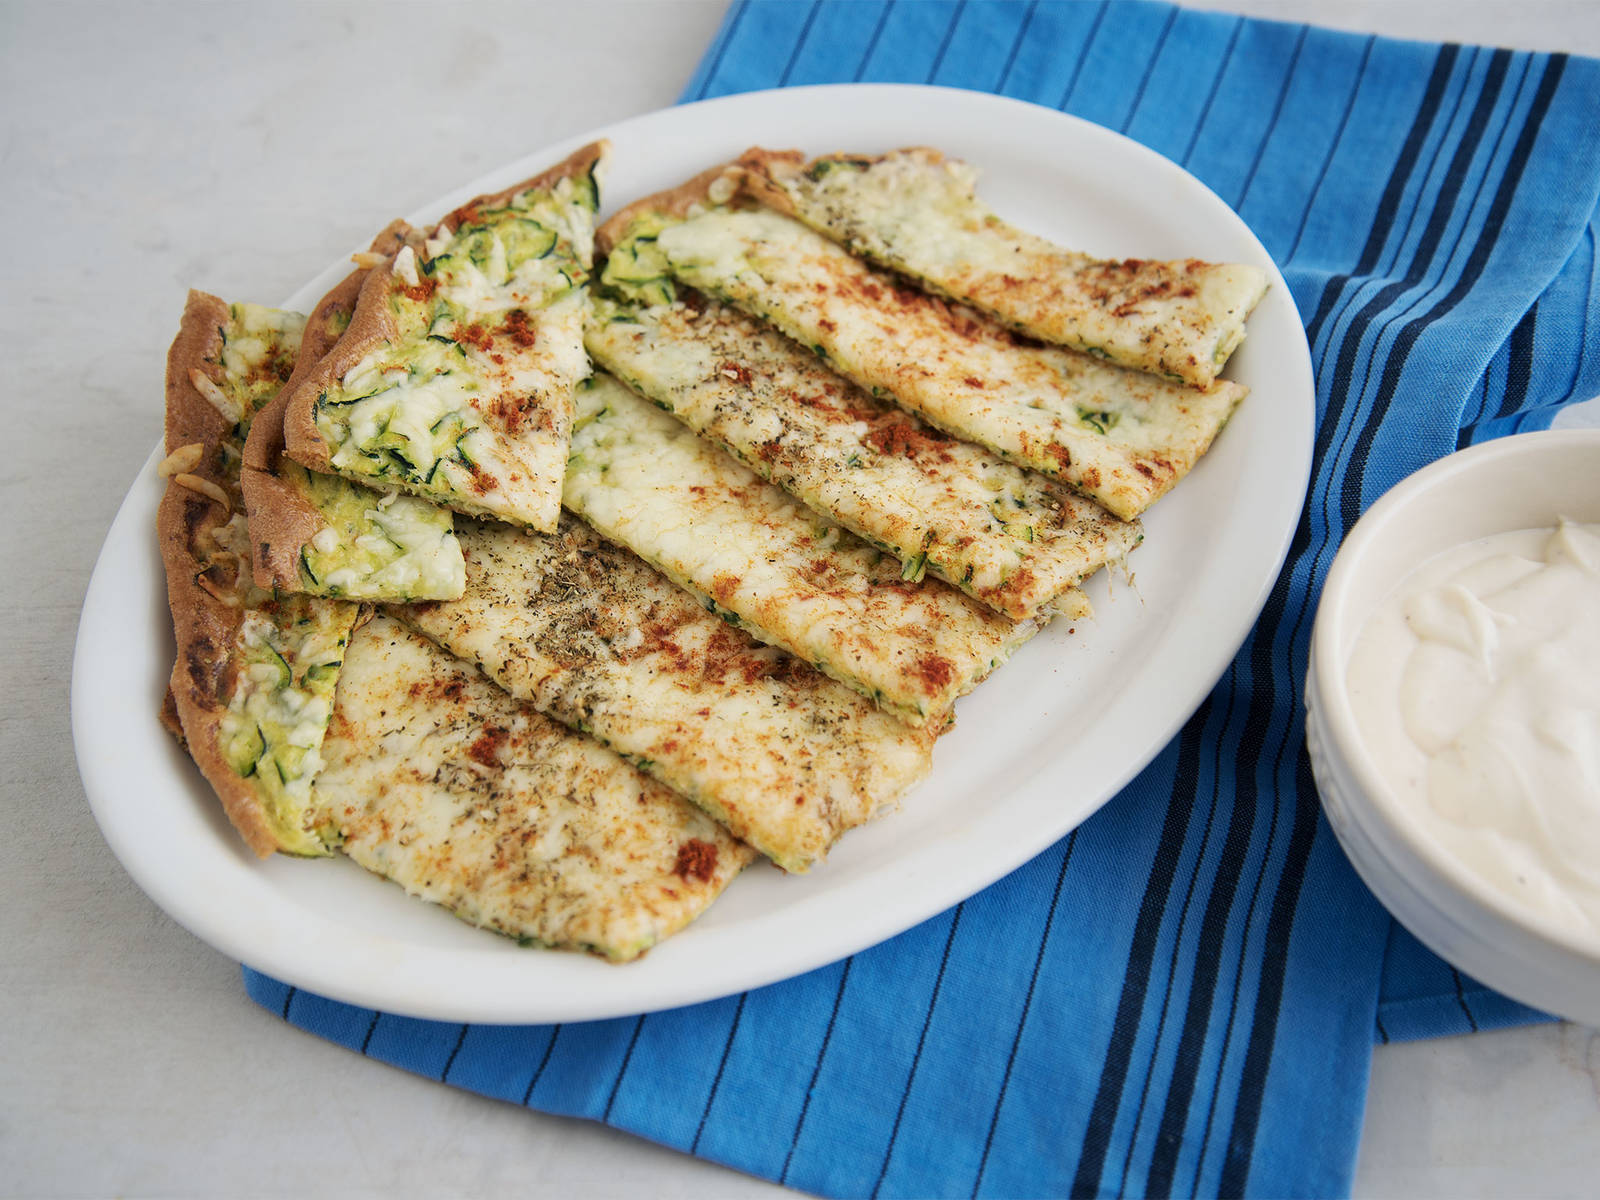 Cheesy zucchini sticks